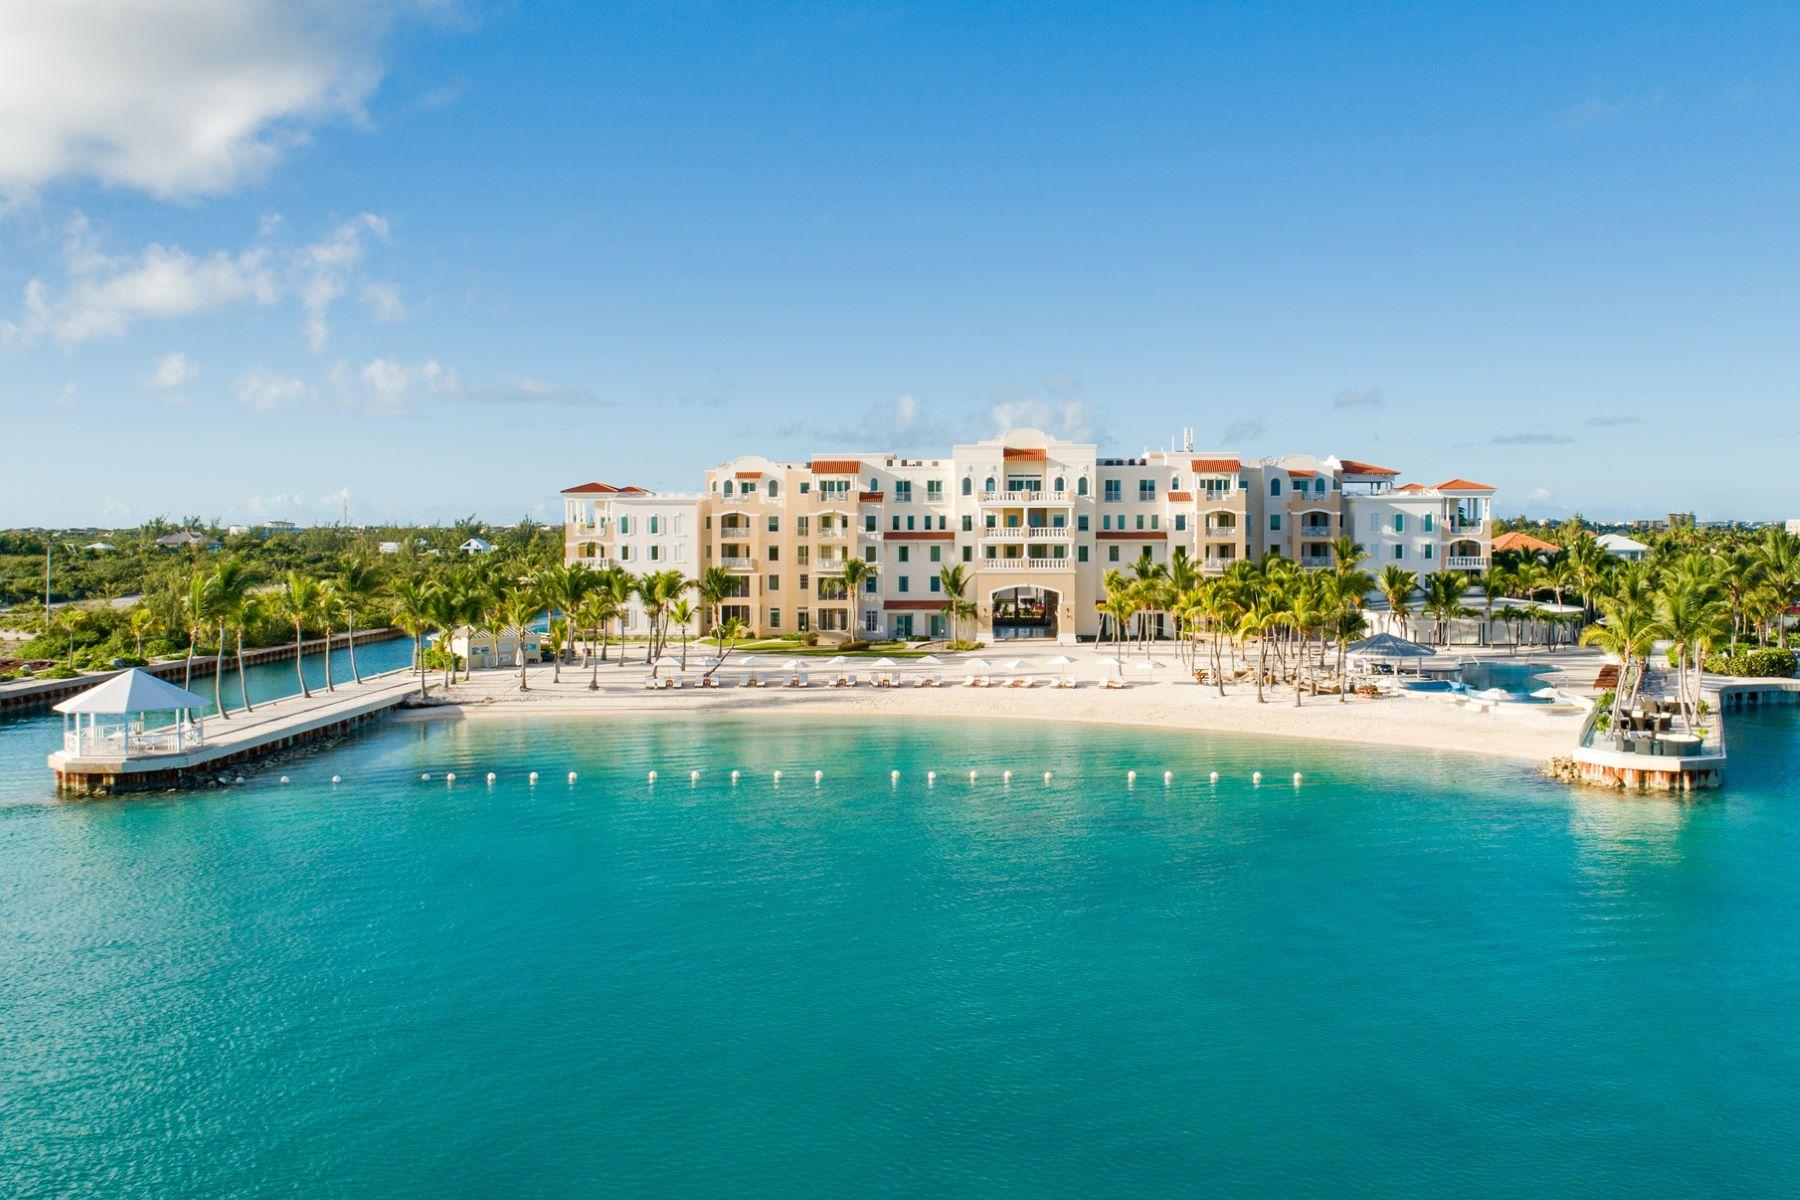 Condominium for Sale at Blue Haven Resort - Suite 105.106 Blue Haven - Suite 105.106 Leeward, Providenciales TKCA 1ZZ Turks And Caicos Islands